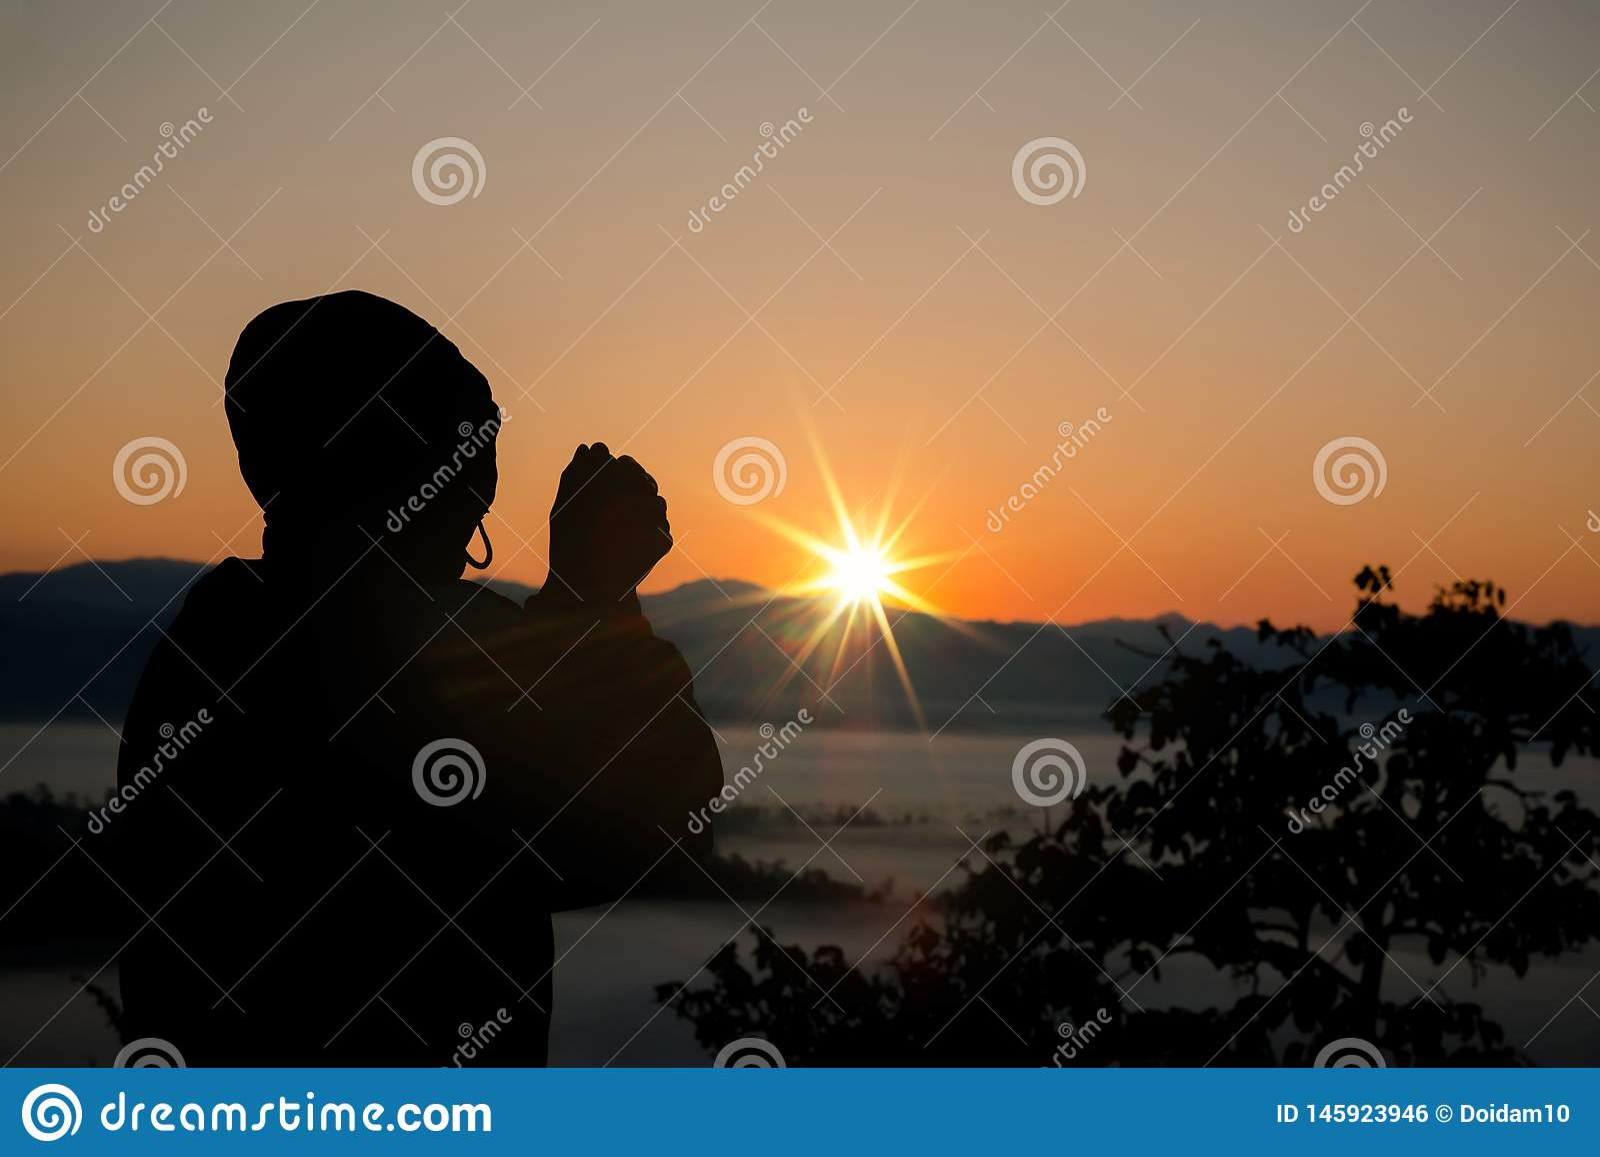 Silhouette of christian man hand praying,spirituality and religion,man praying to god.